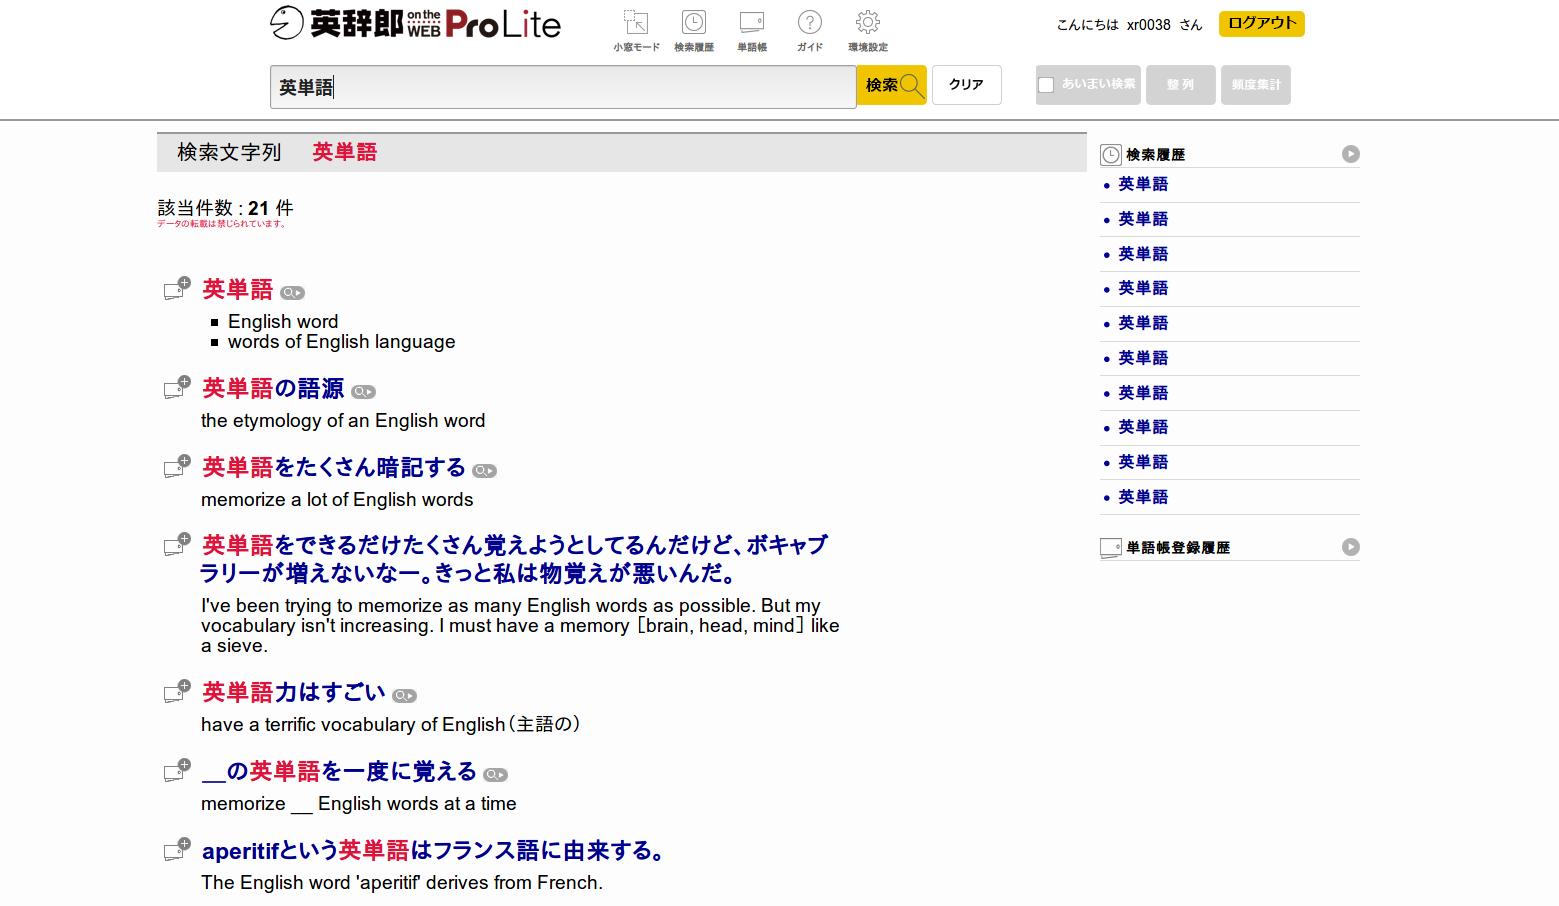 Web on 辞 英 pro the lite 郎